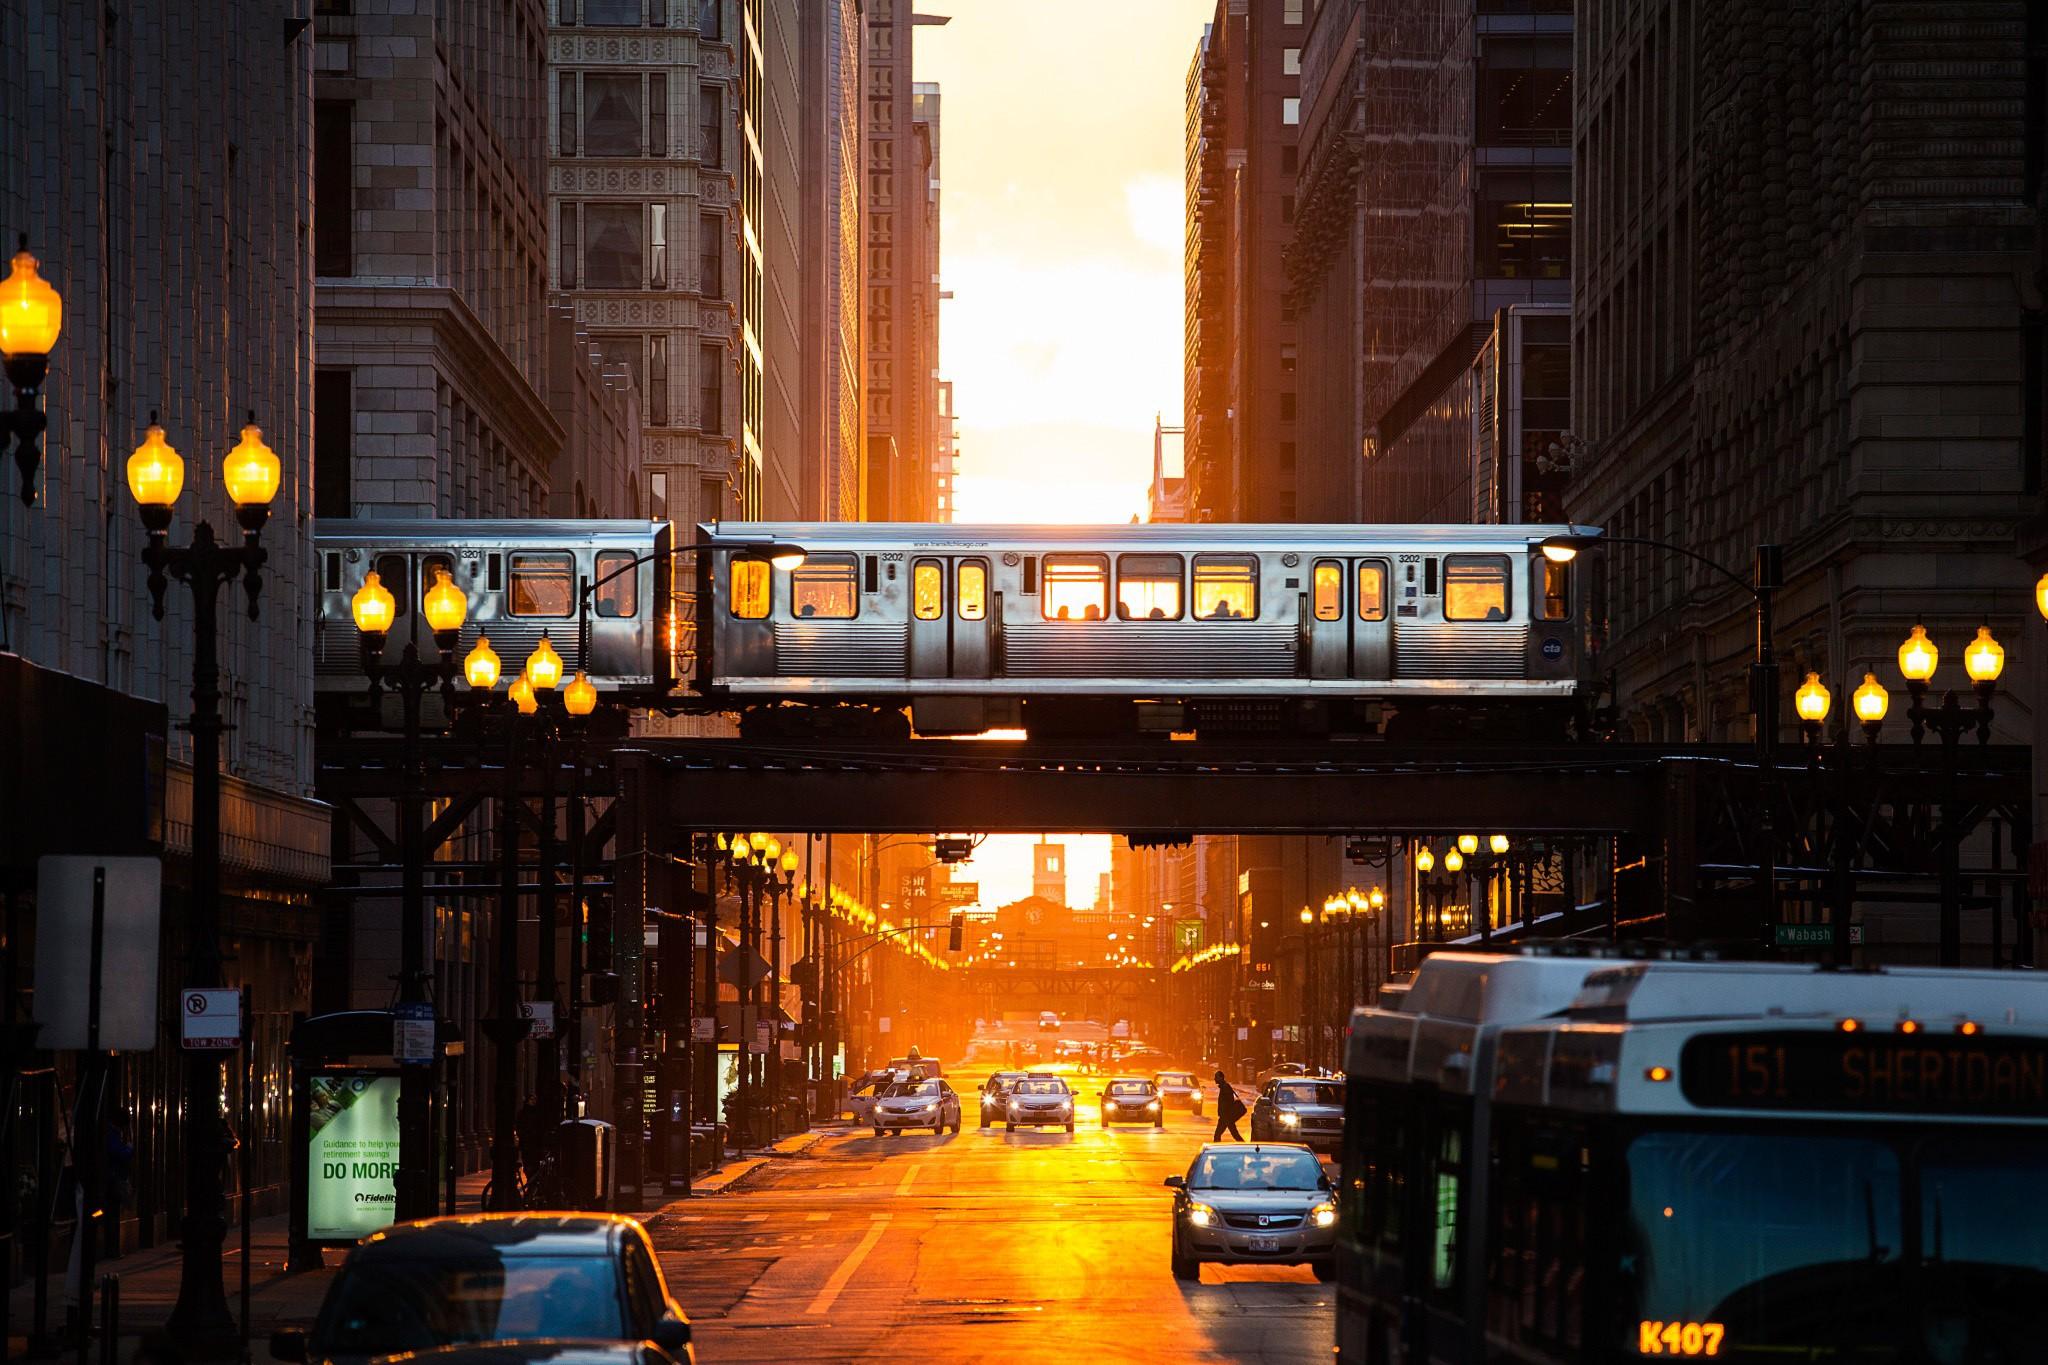 Wallpaper Sunlight Street Light Sunset City Cityscape Night